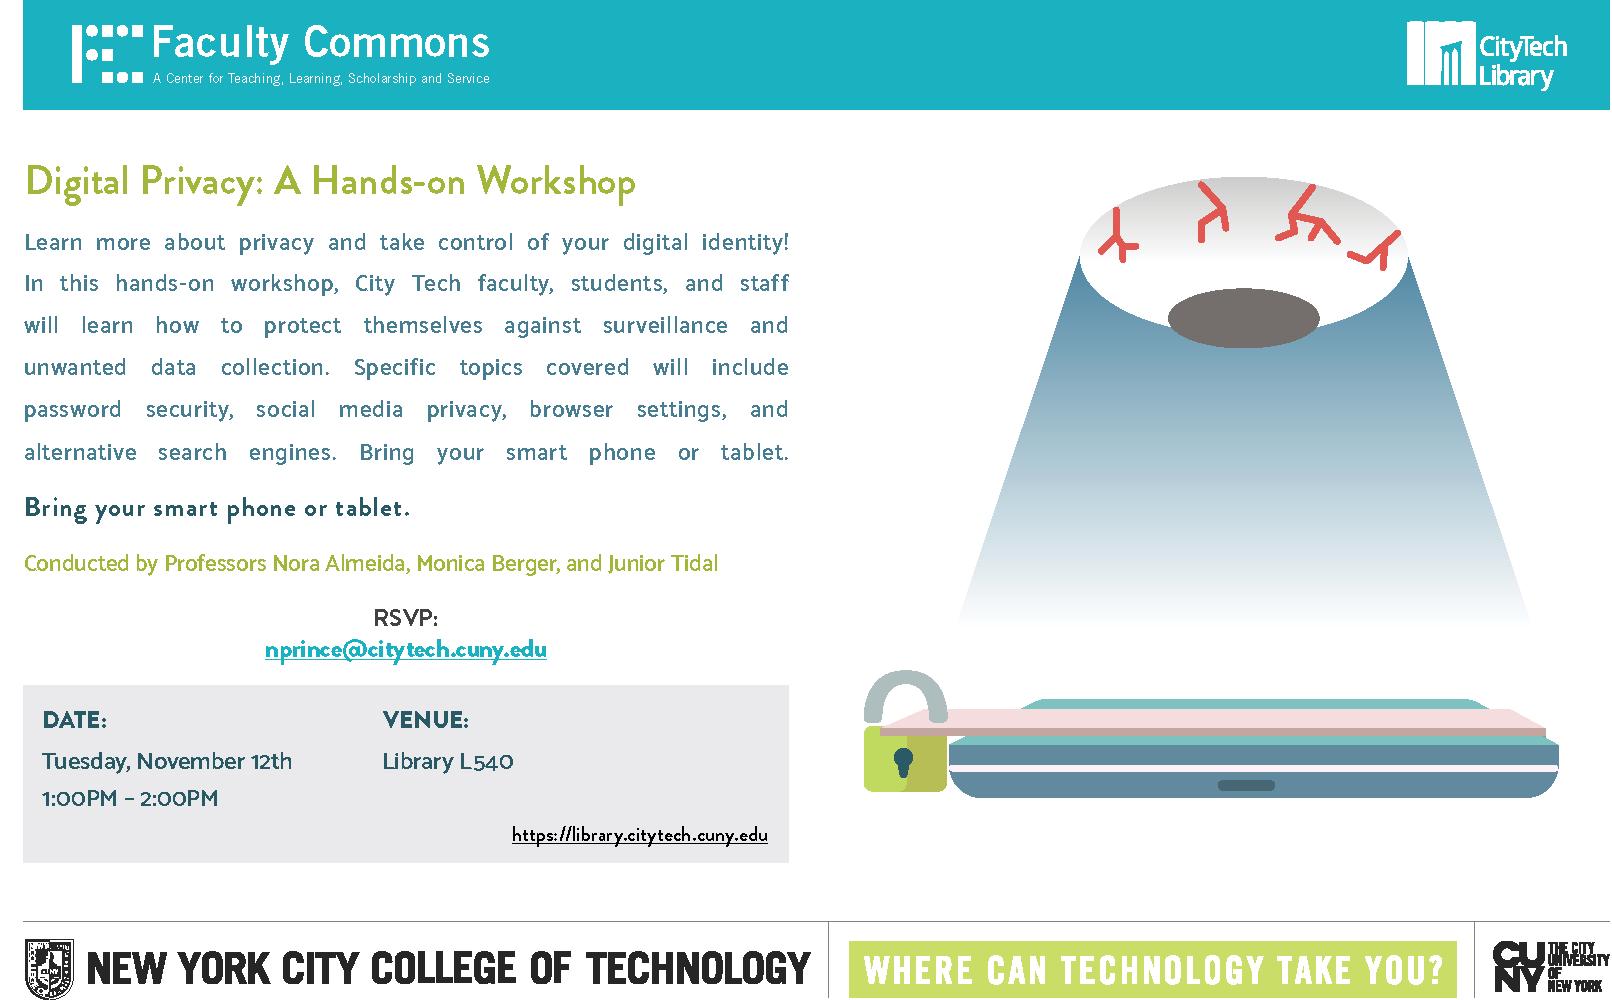 Digital Privacy: A Hands-on Workshop 4